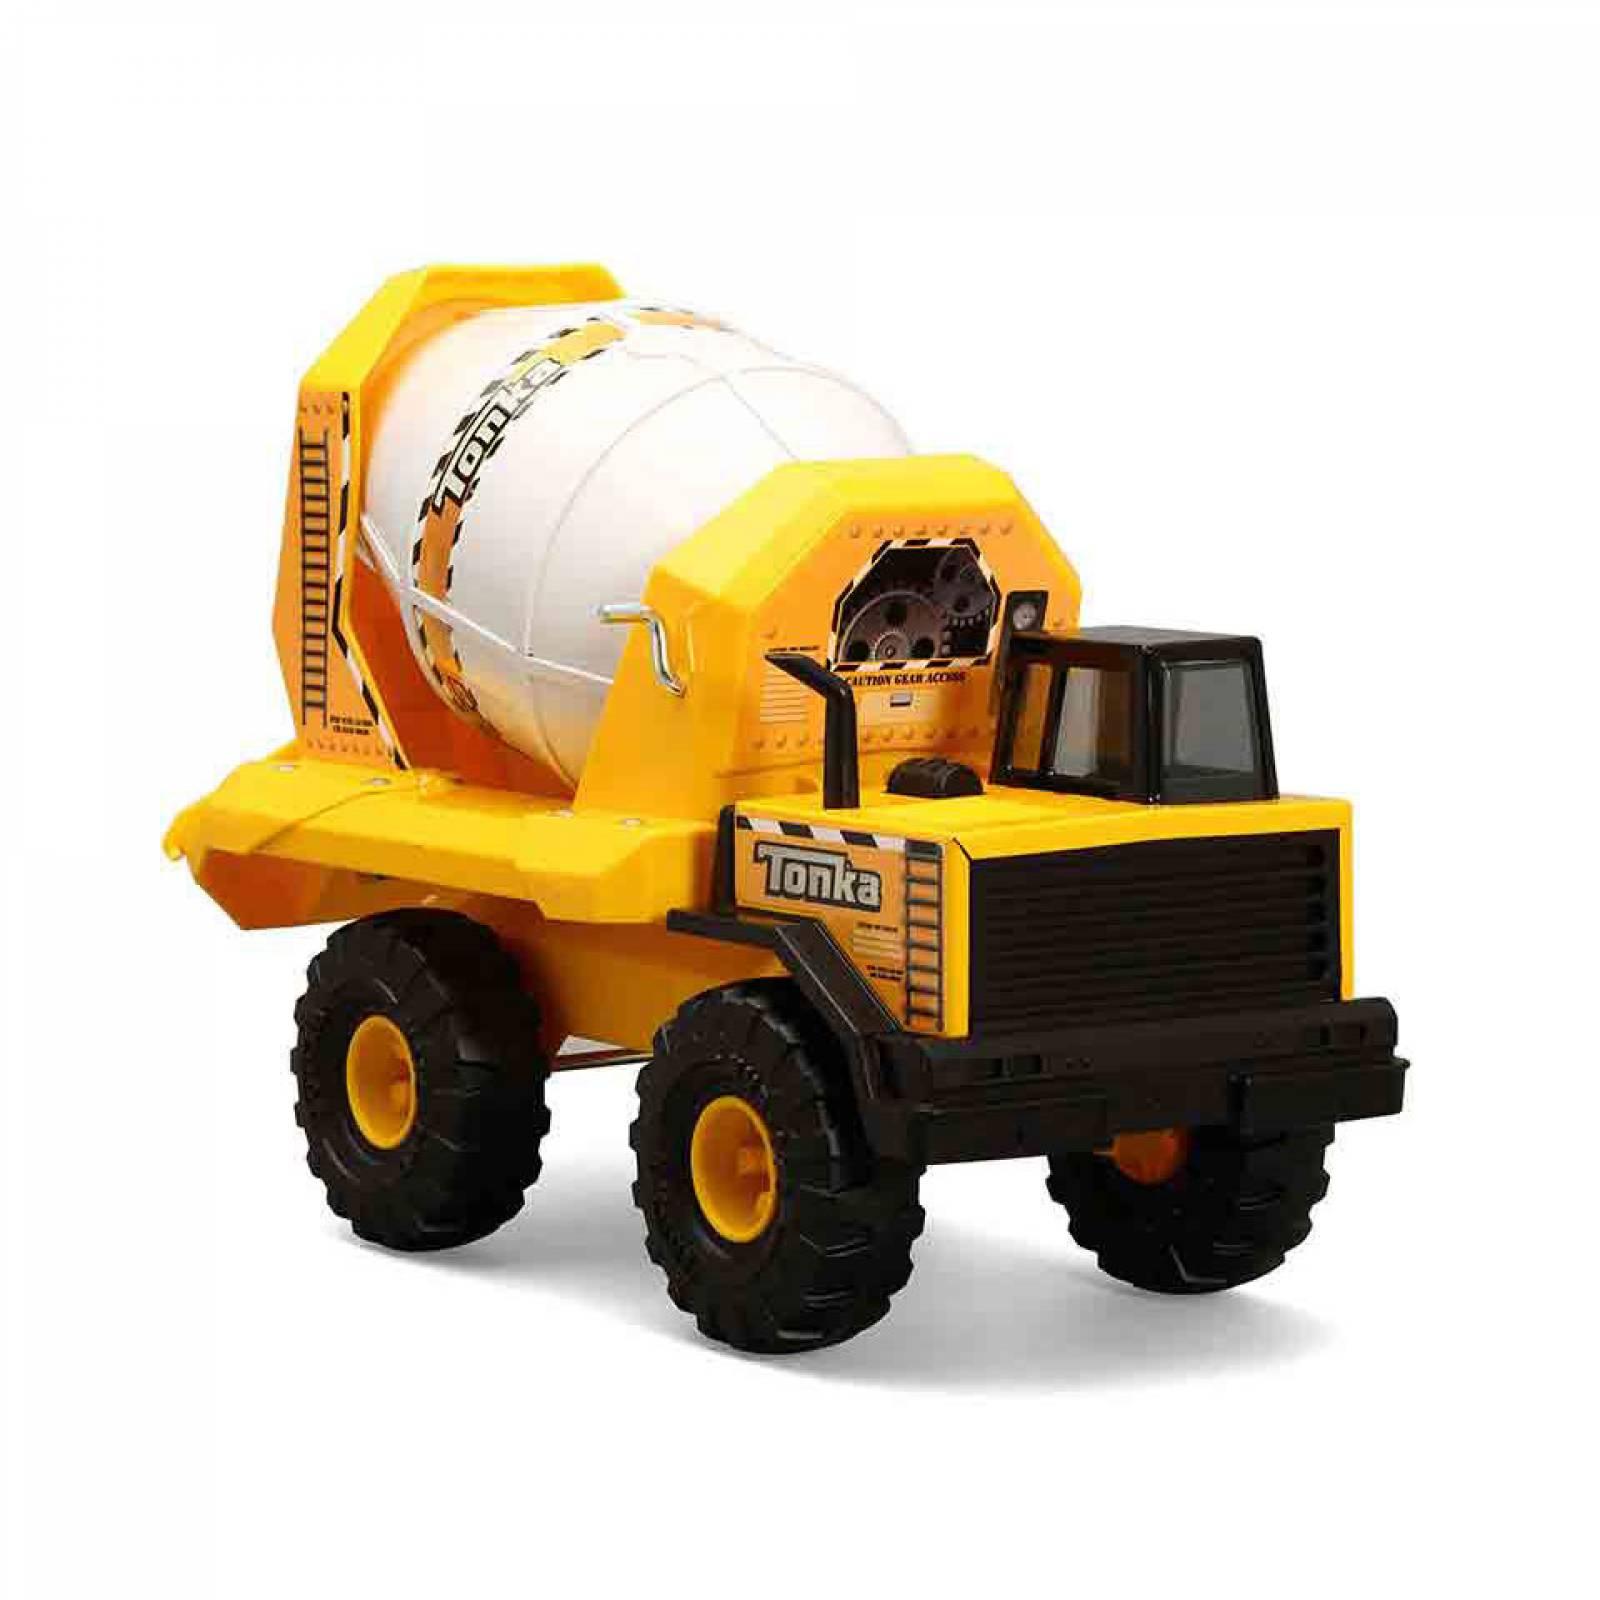 Tonka Power Movers Cement Mixer